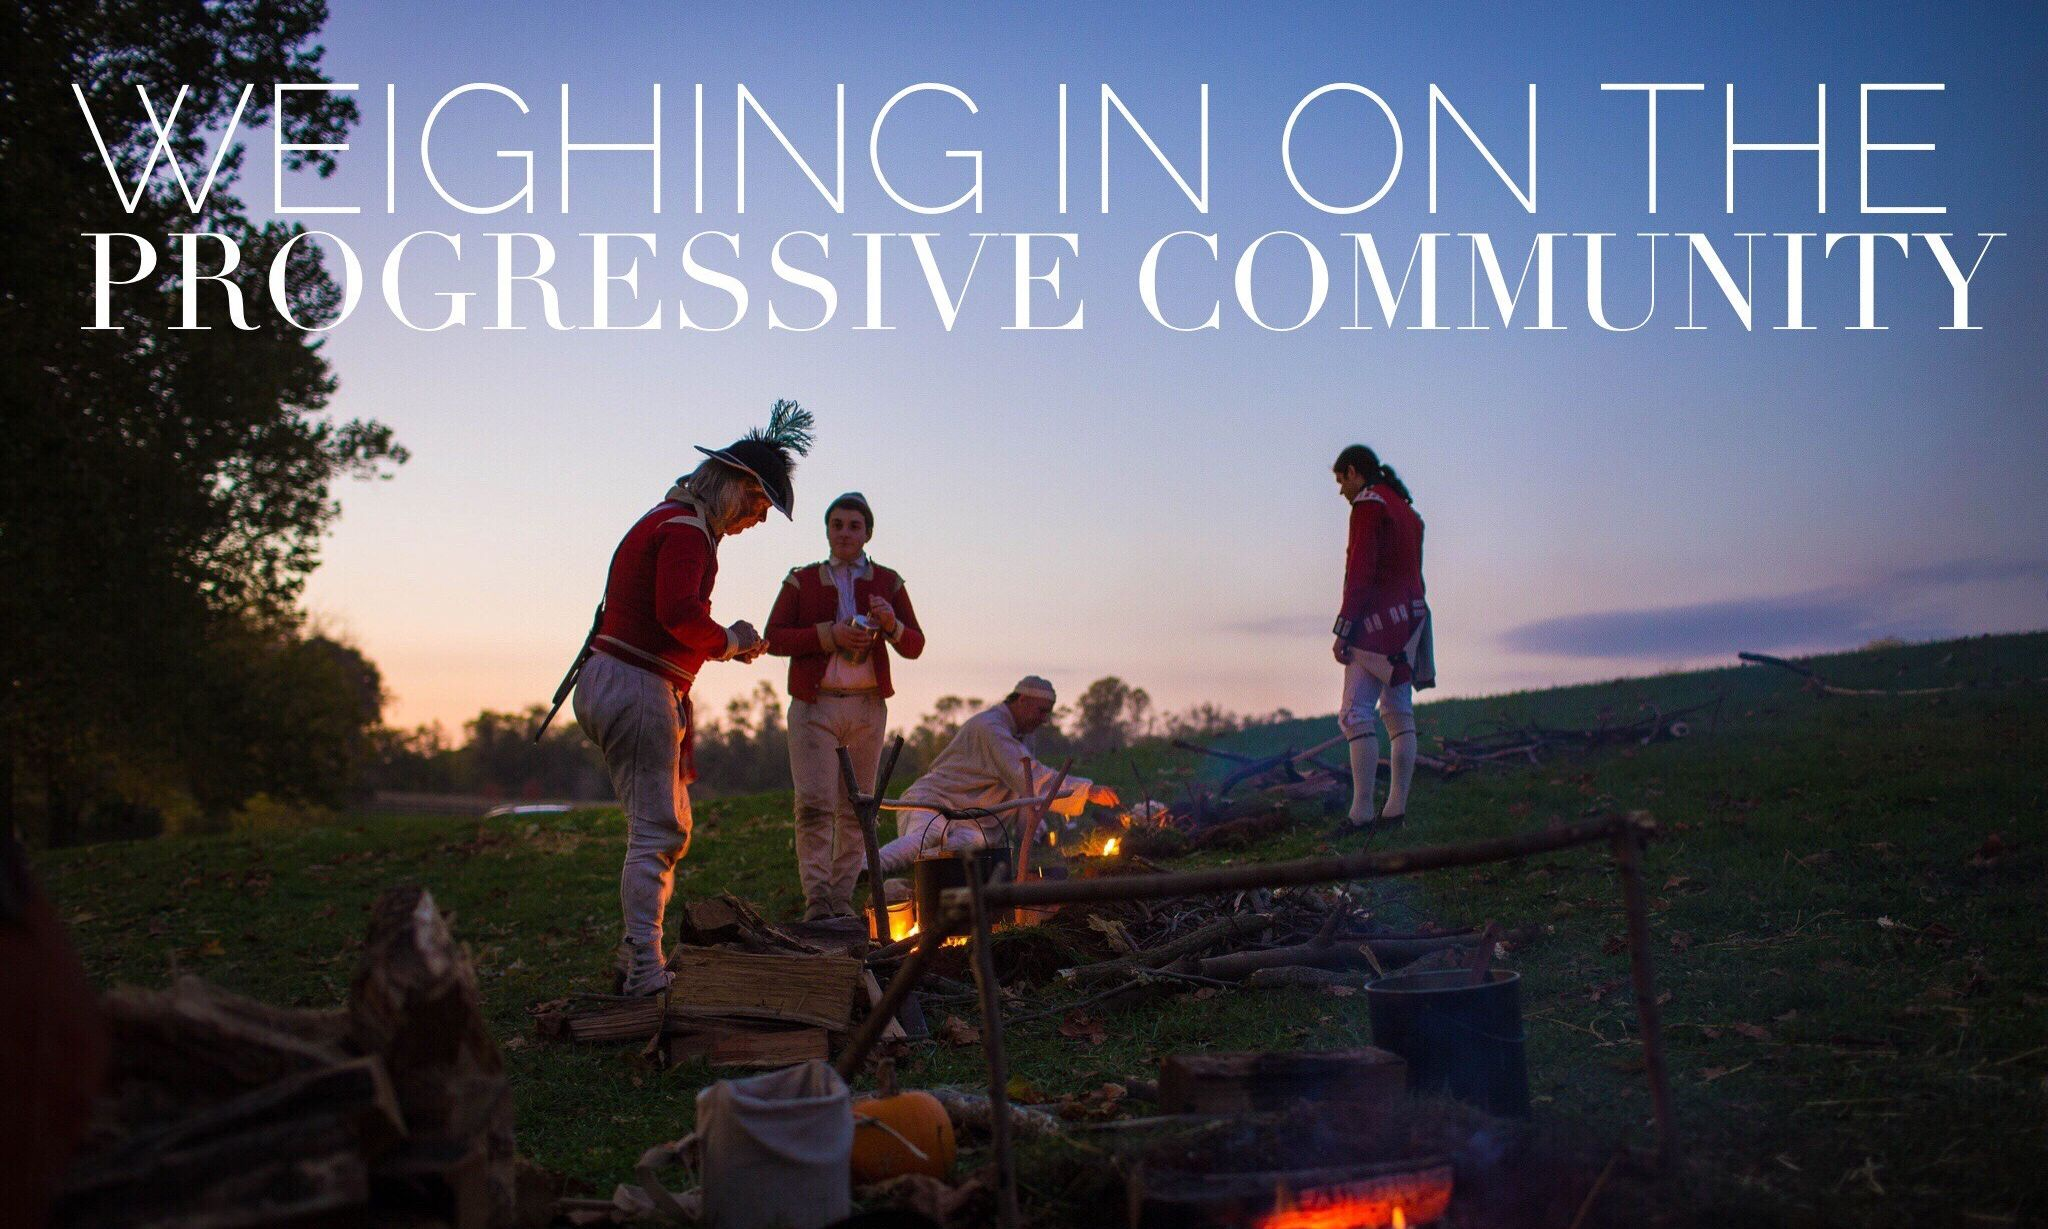 Progressive community - Historically Speaking